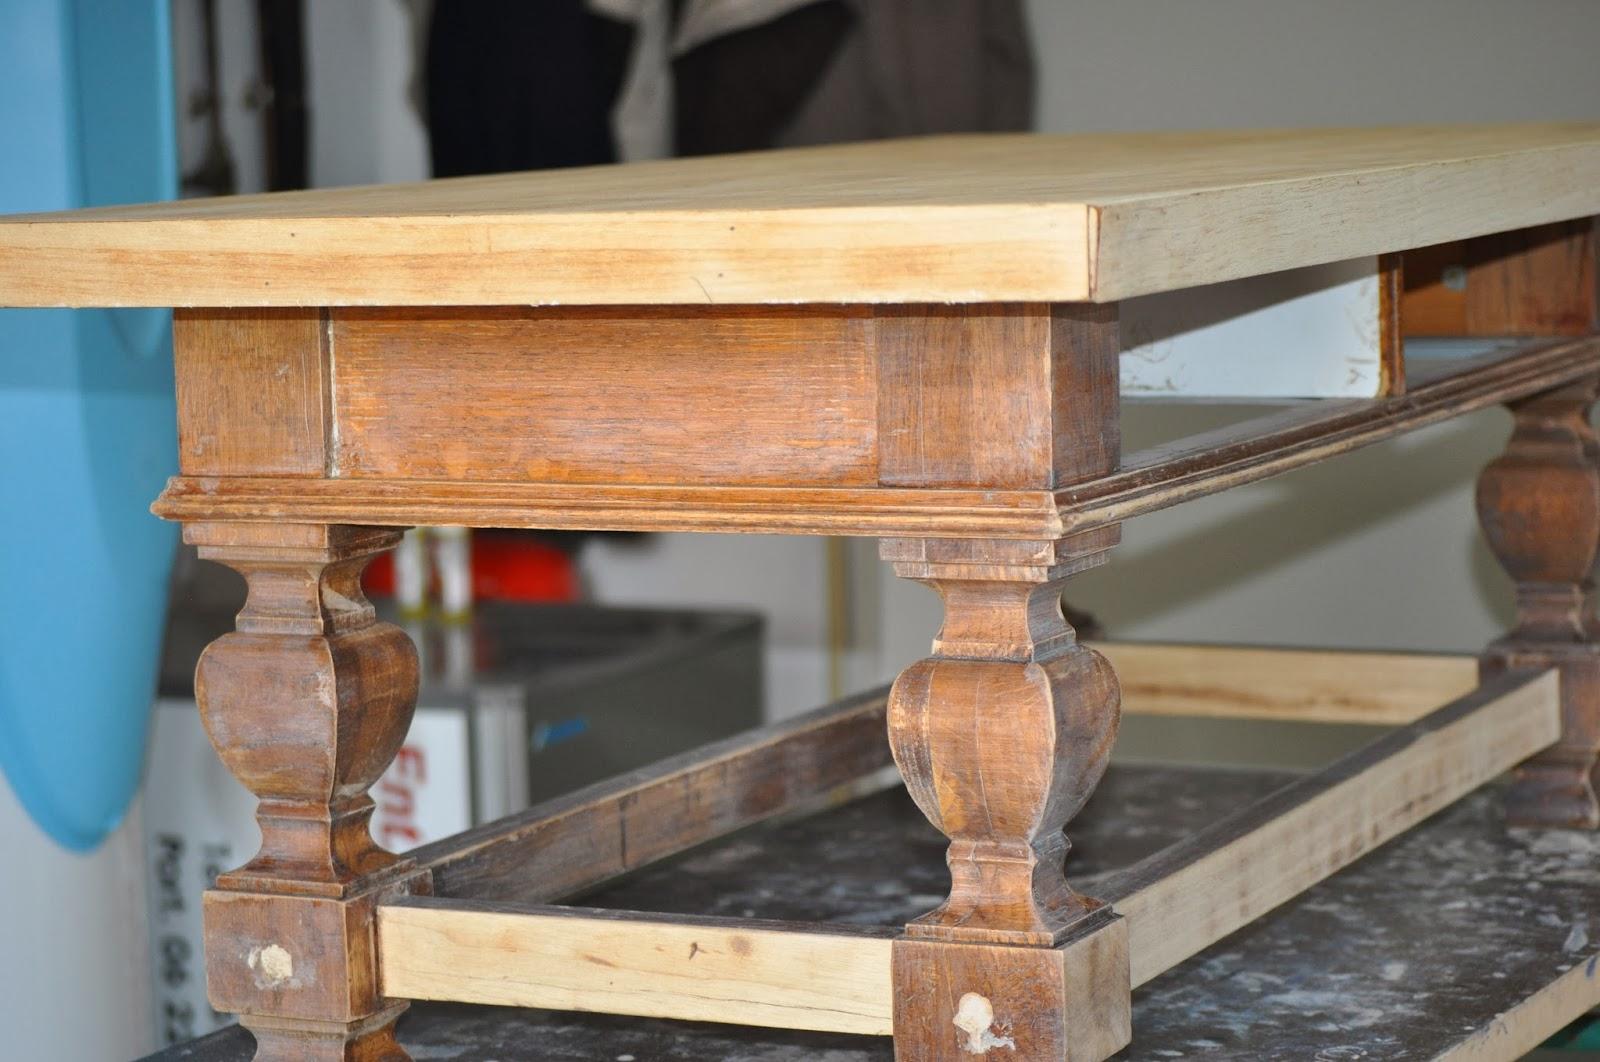 Bois et patines nathalie madrenes table basse patinee - Relooker une table en bois ...